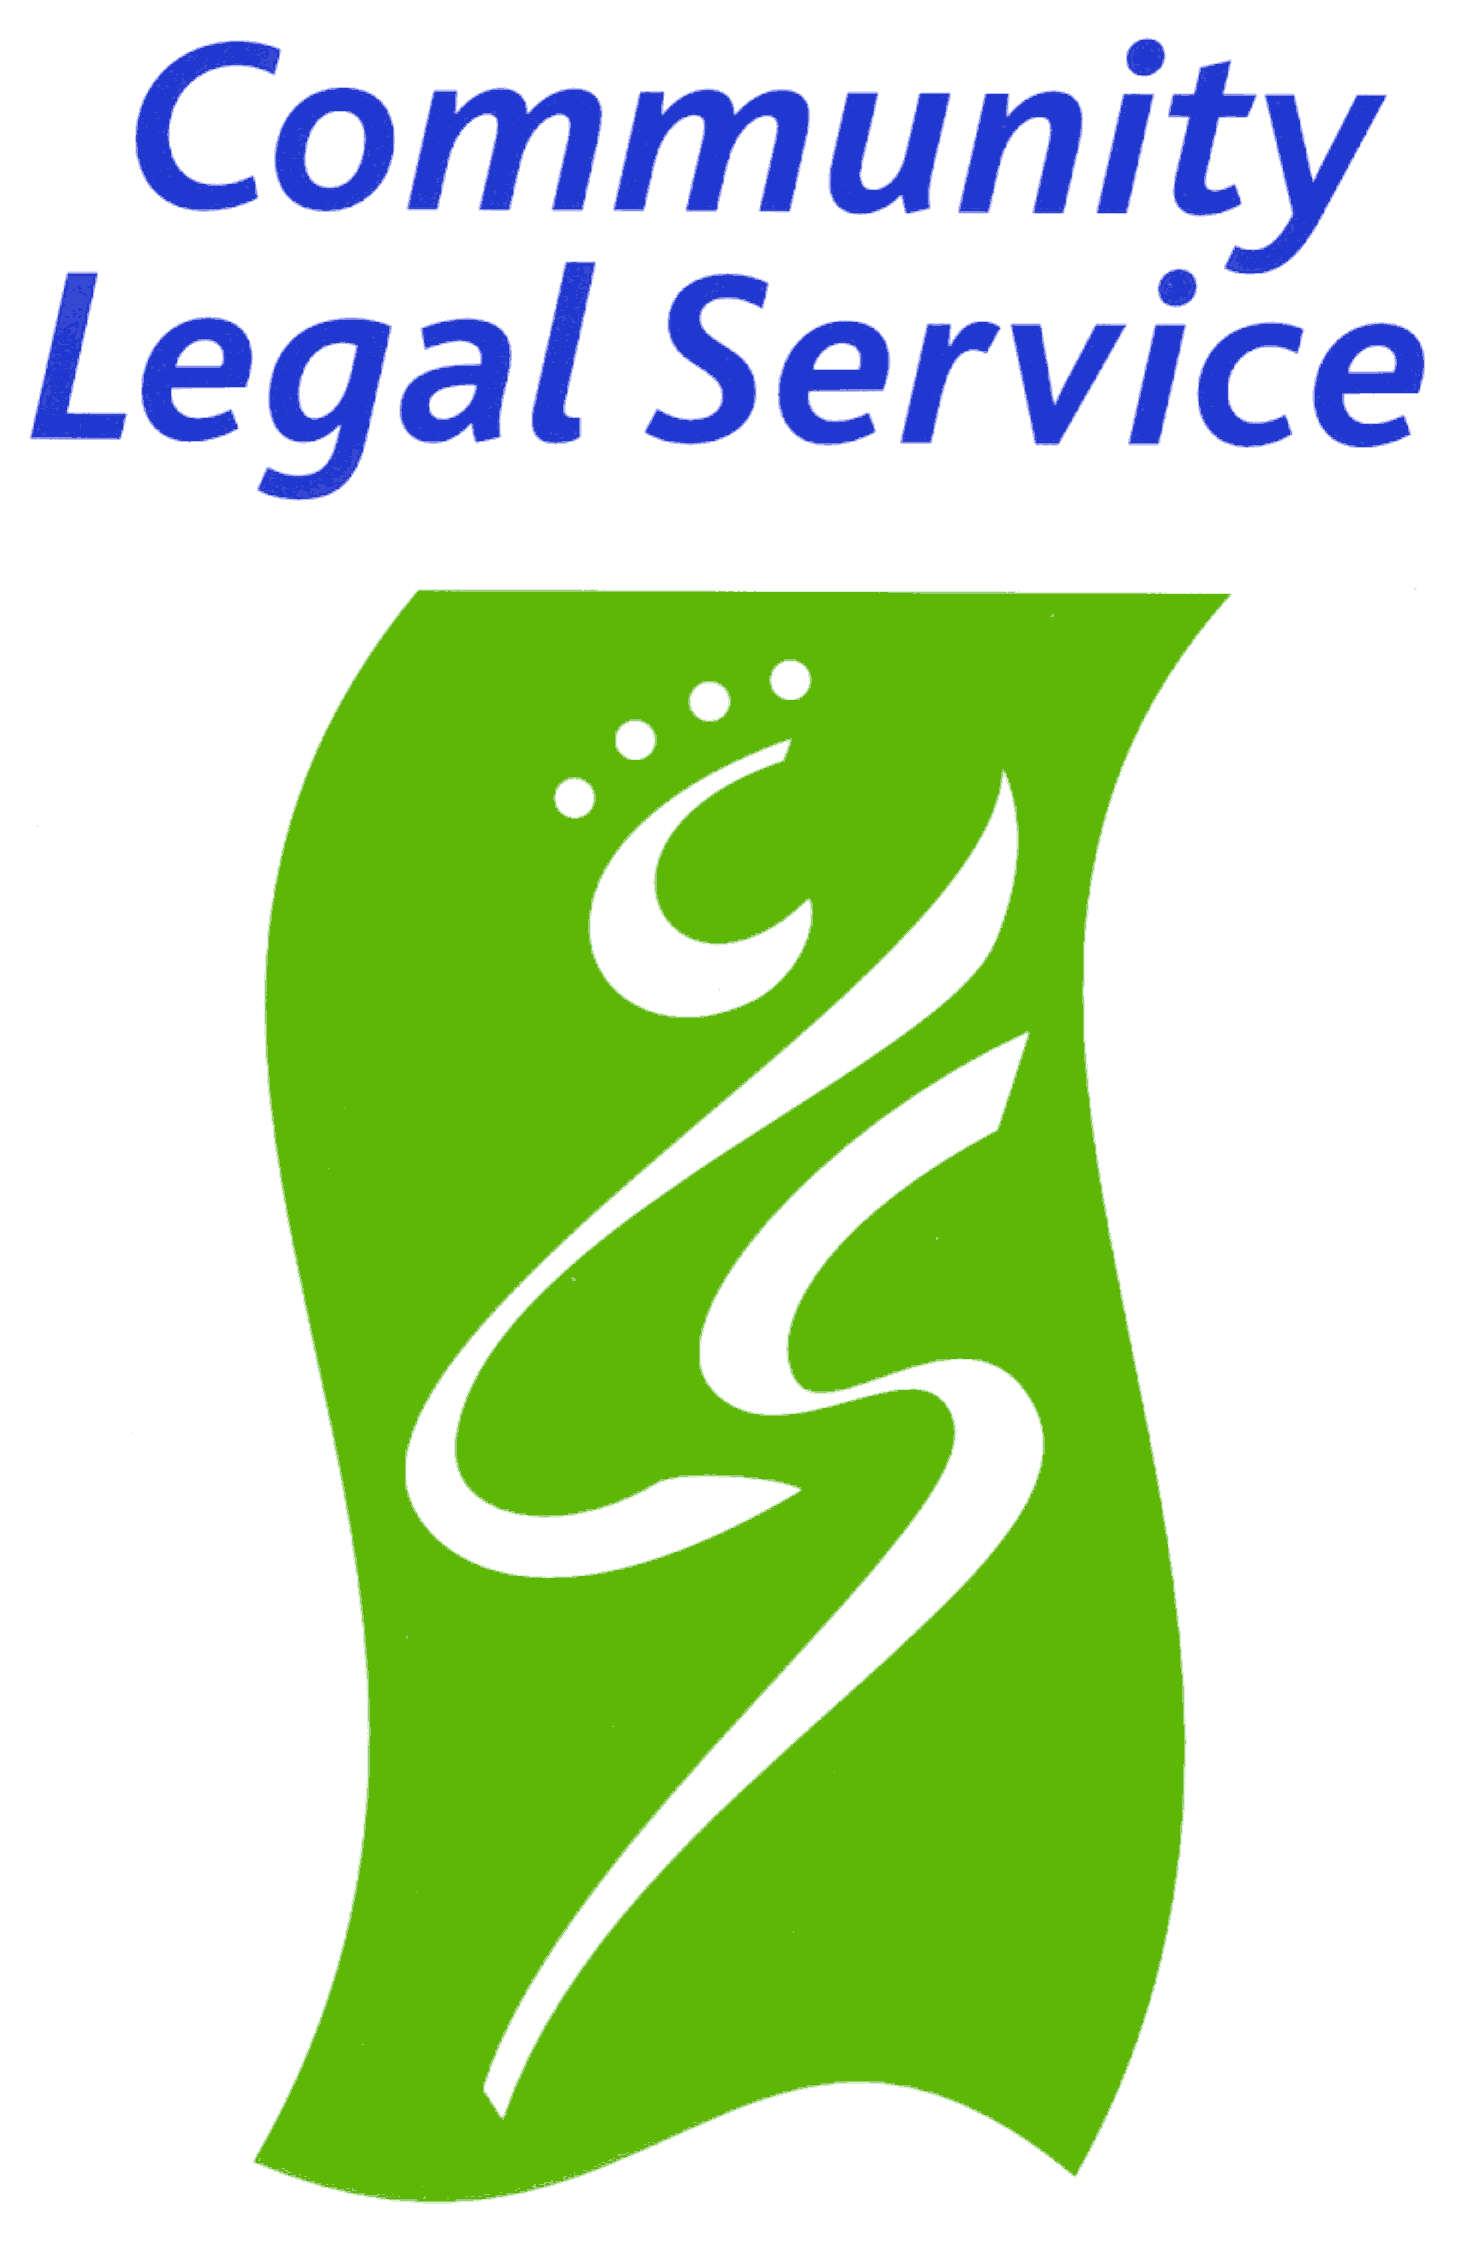 Community Legal Service Logo photo - 1